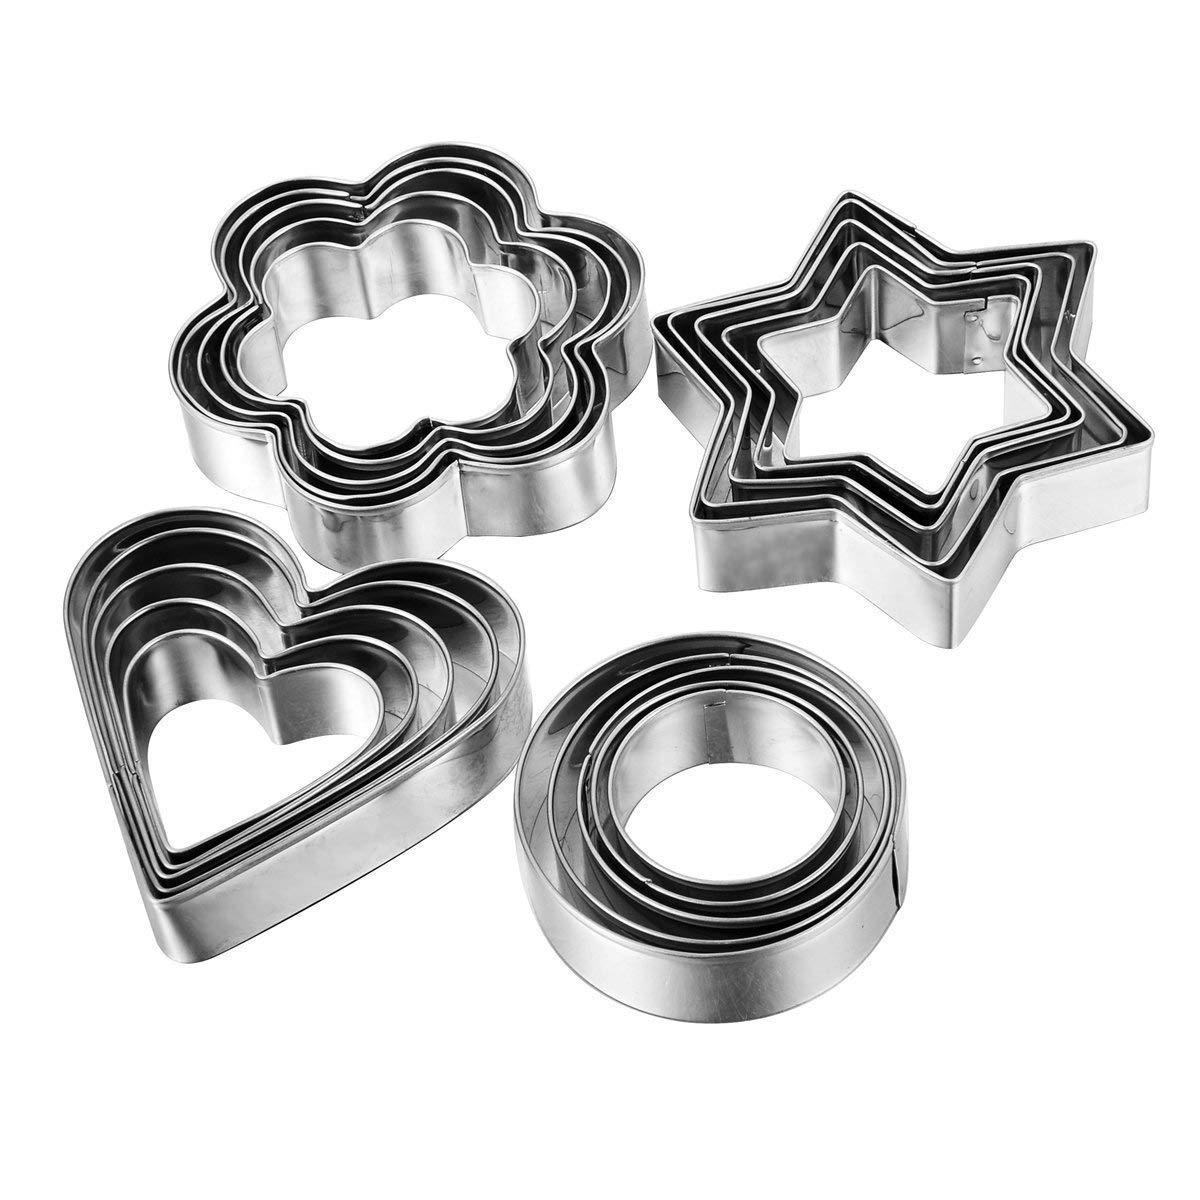 Amazon Com  Home Value 12pc Metal Cookie Cutters  3 Stars Shape, 3